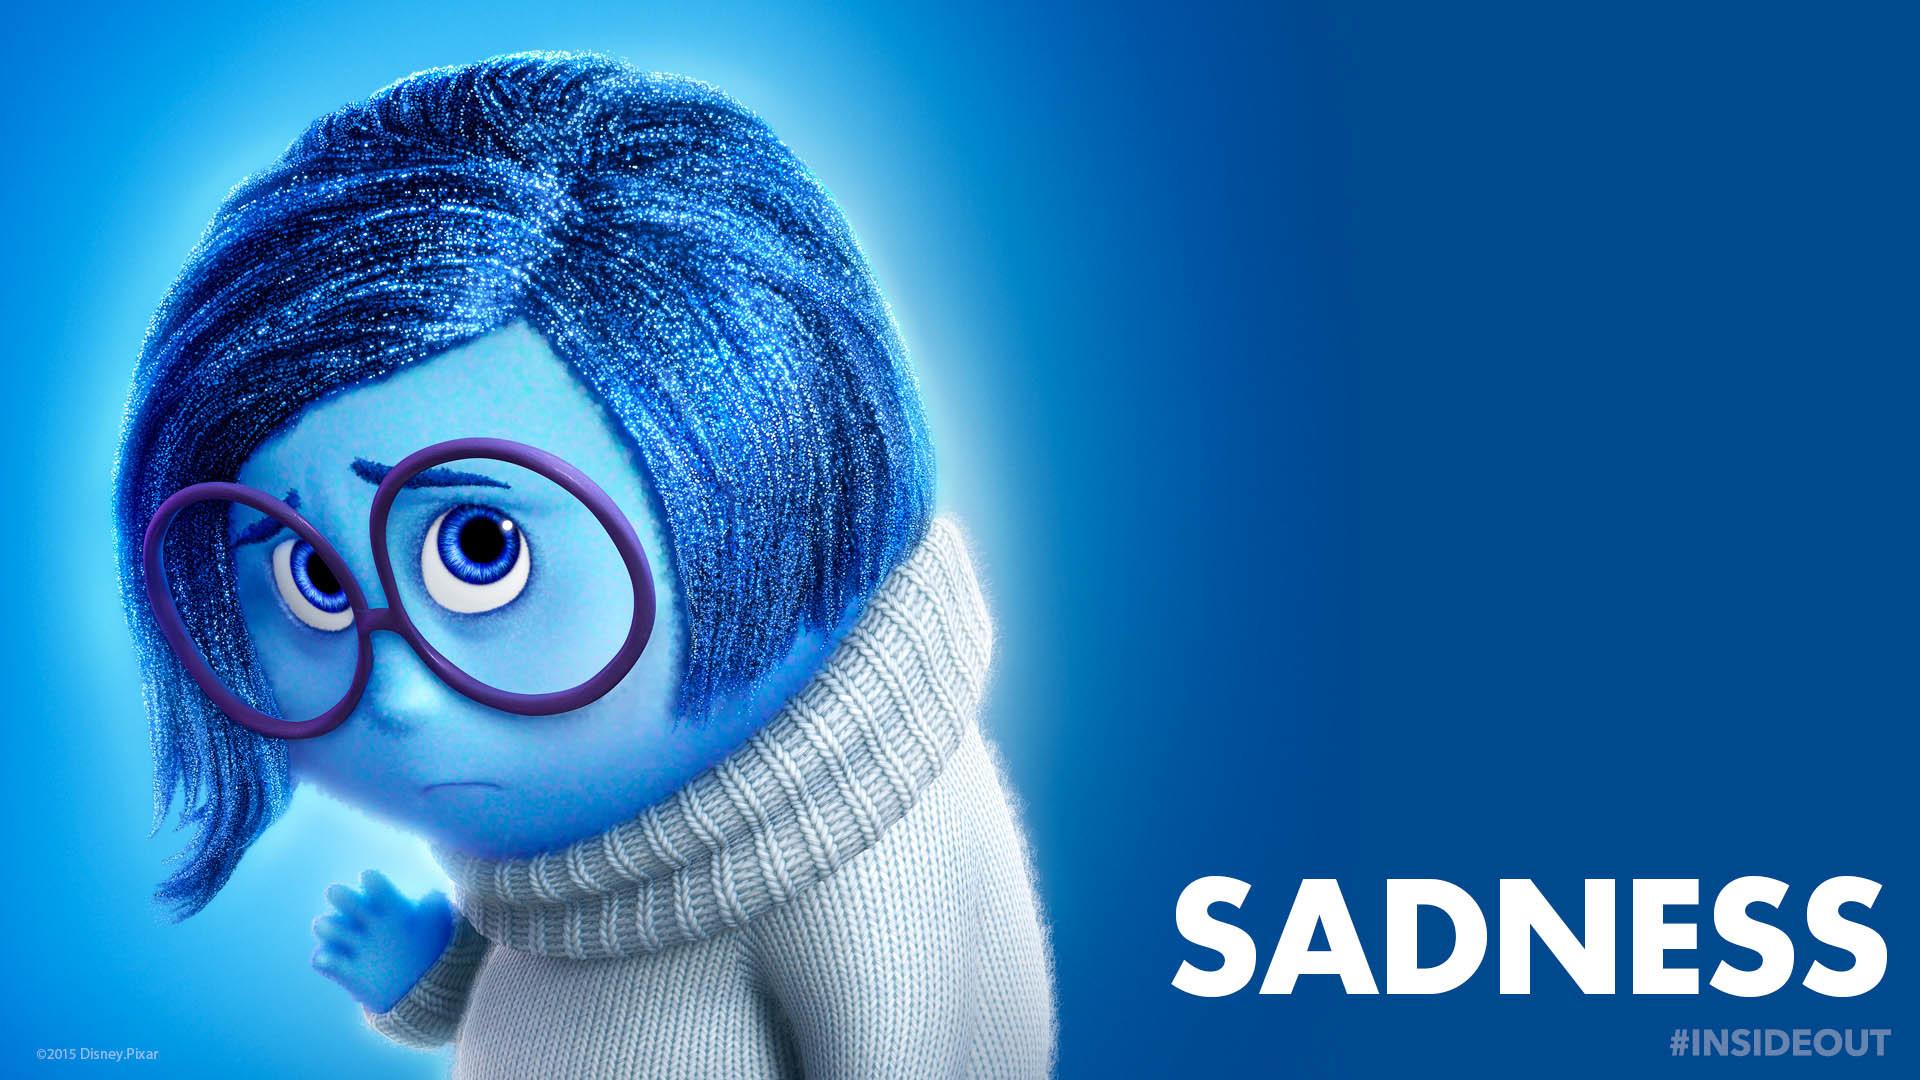 Inside Out character: Sadness – Disney Pixar wallpaper